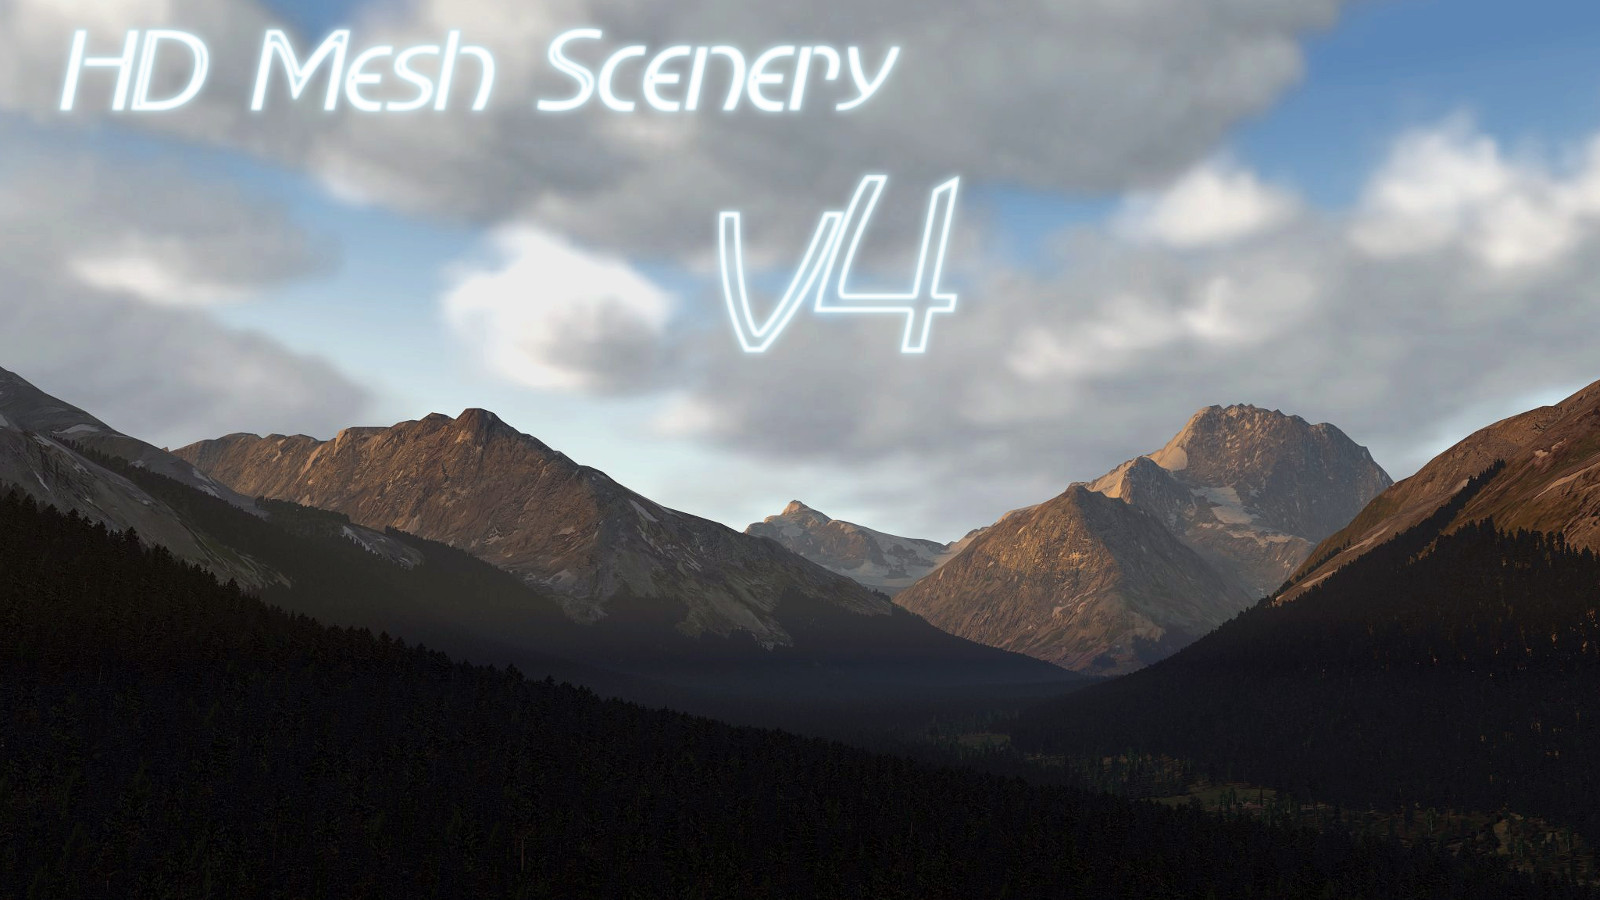 HD Mesh Scenery v4 (for X-Plane 11)